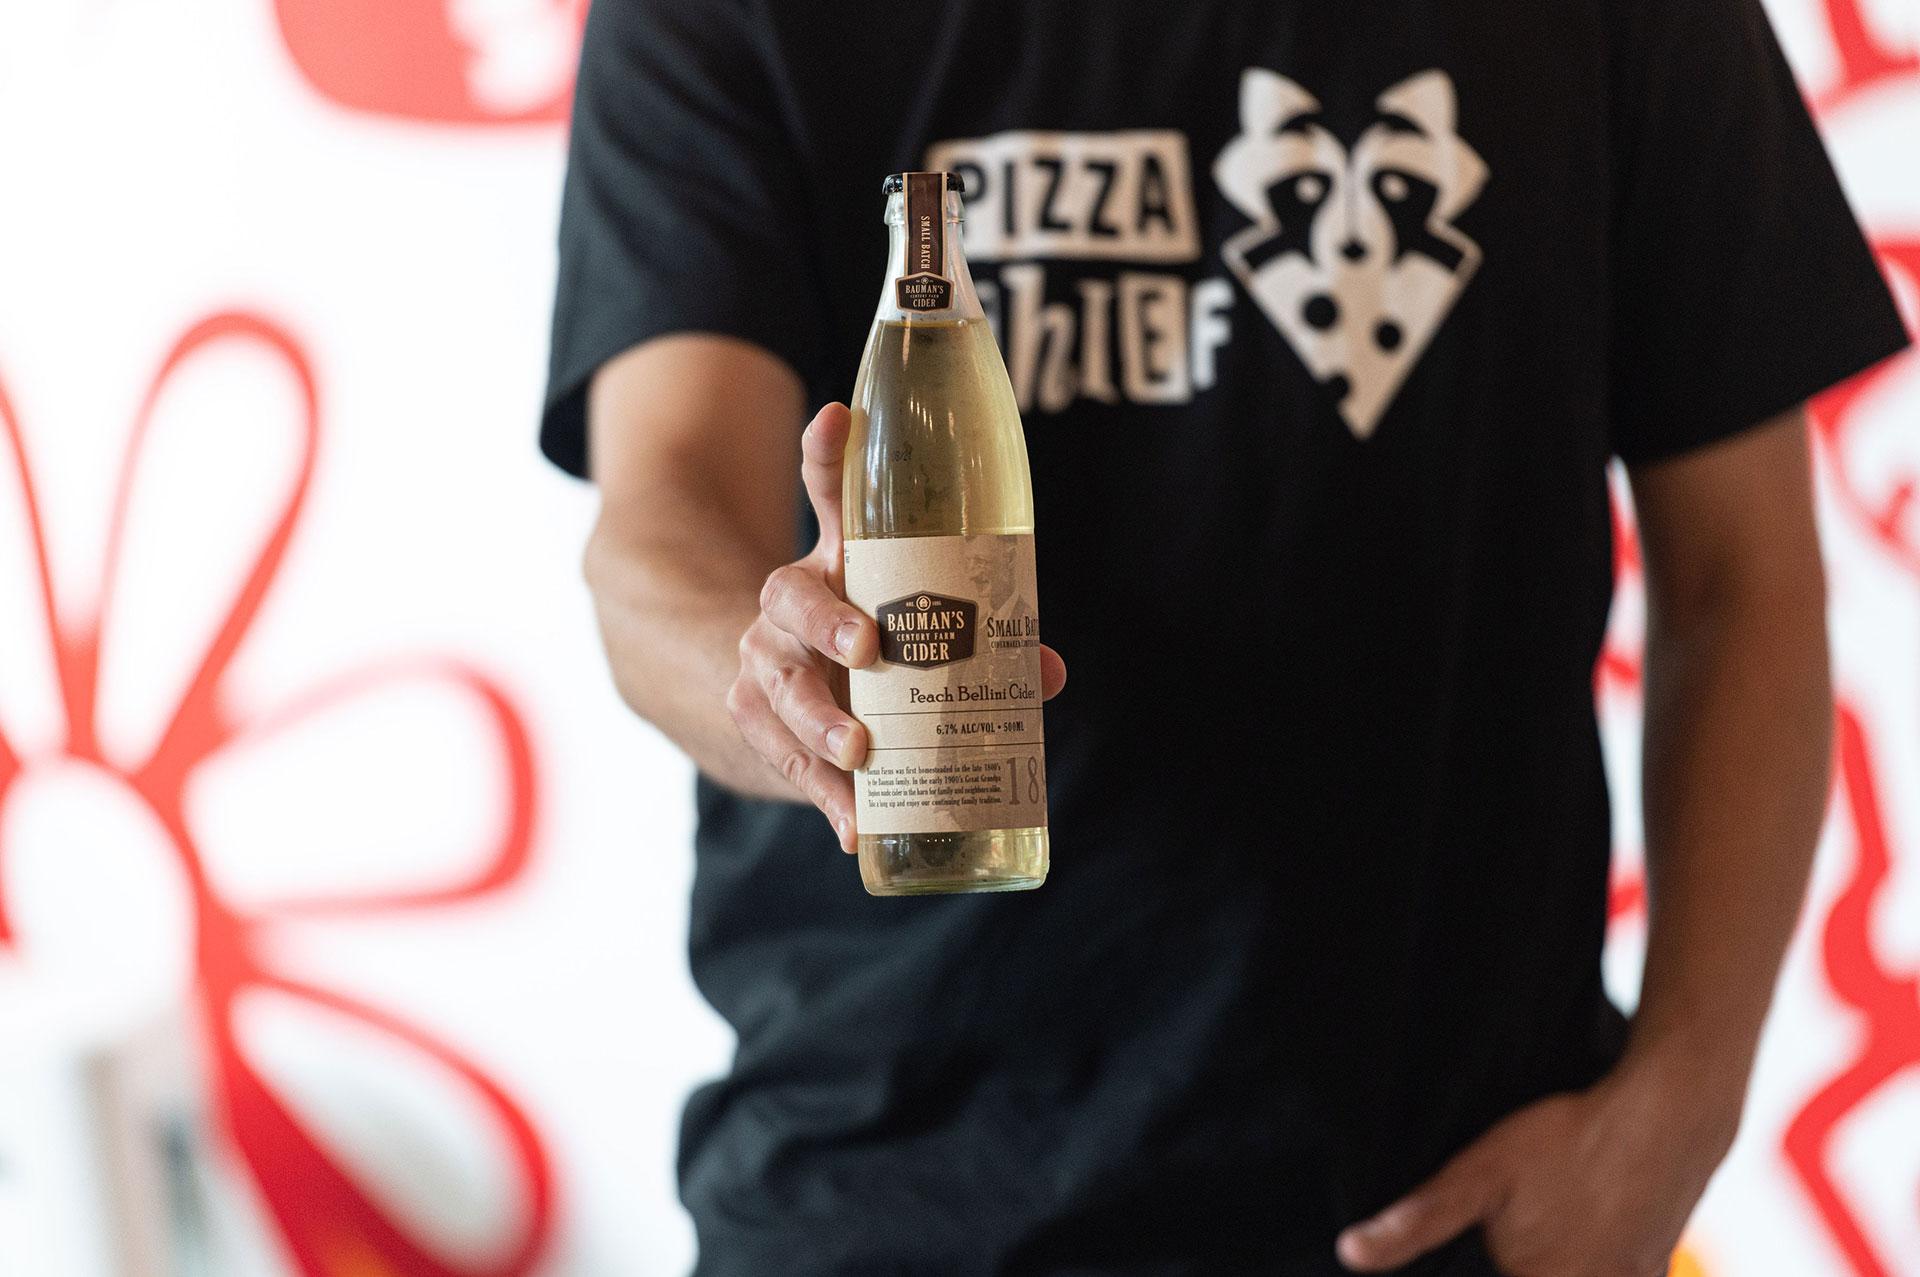 pizza-thief-waiter-holding-cider-bottle